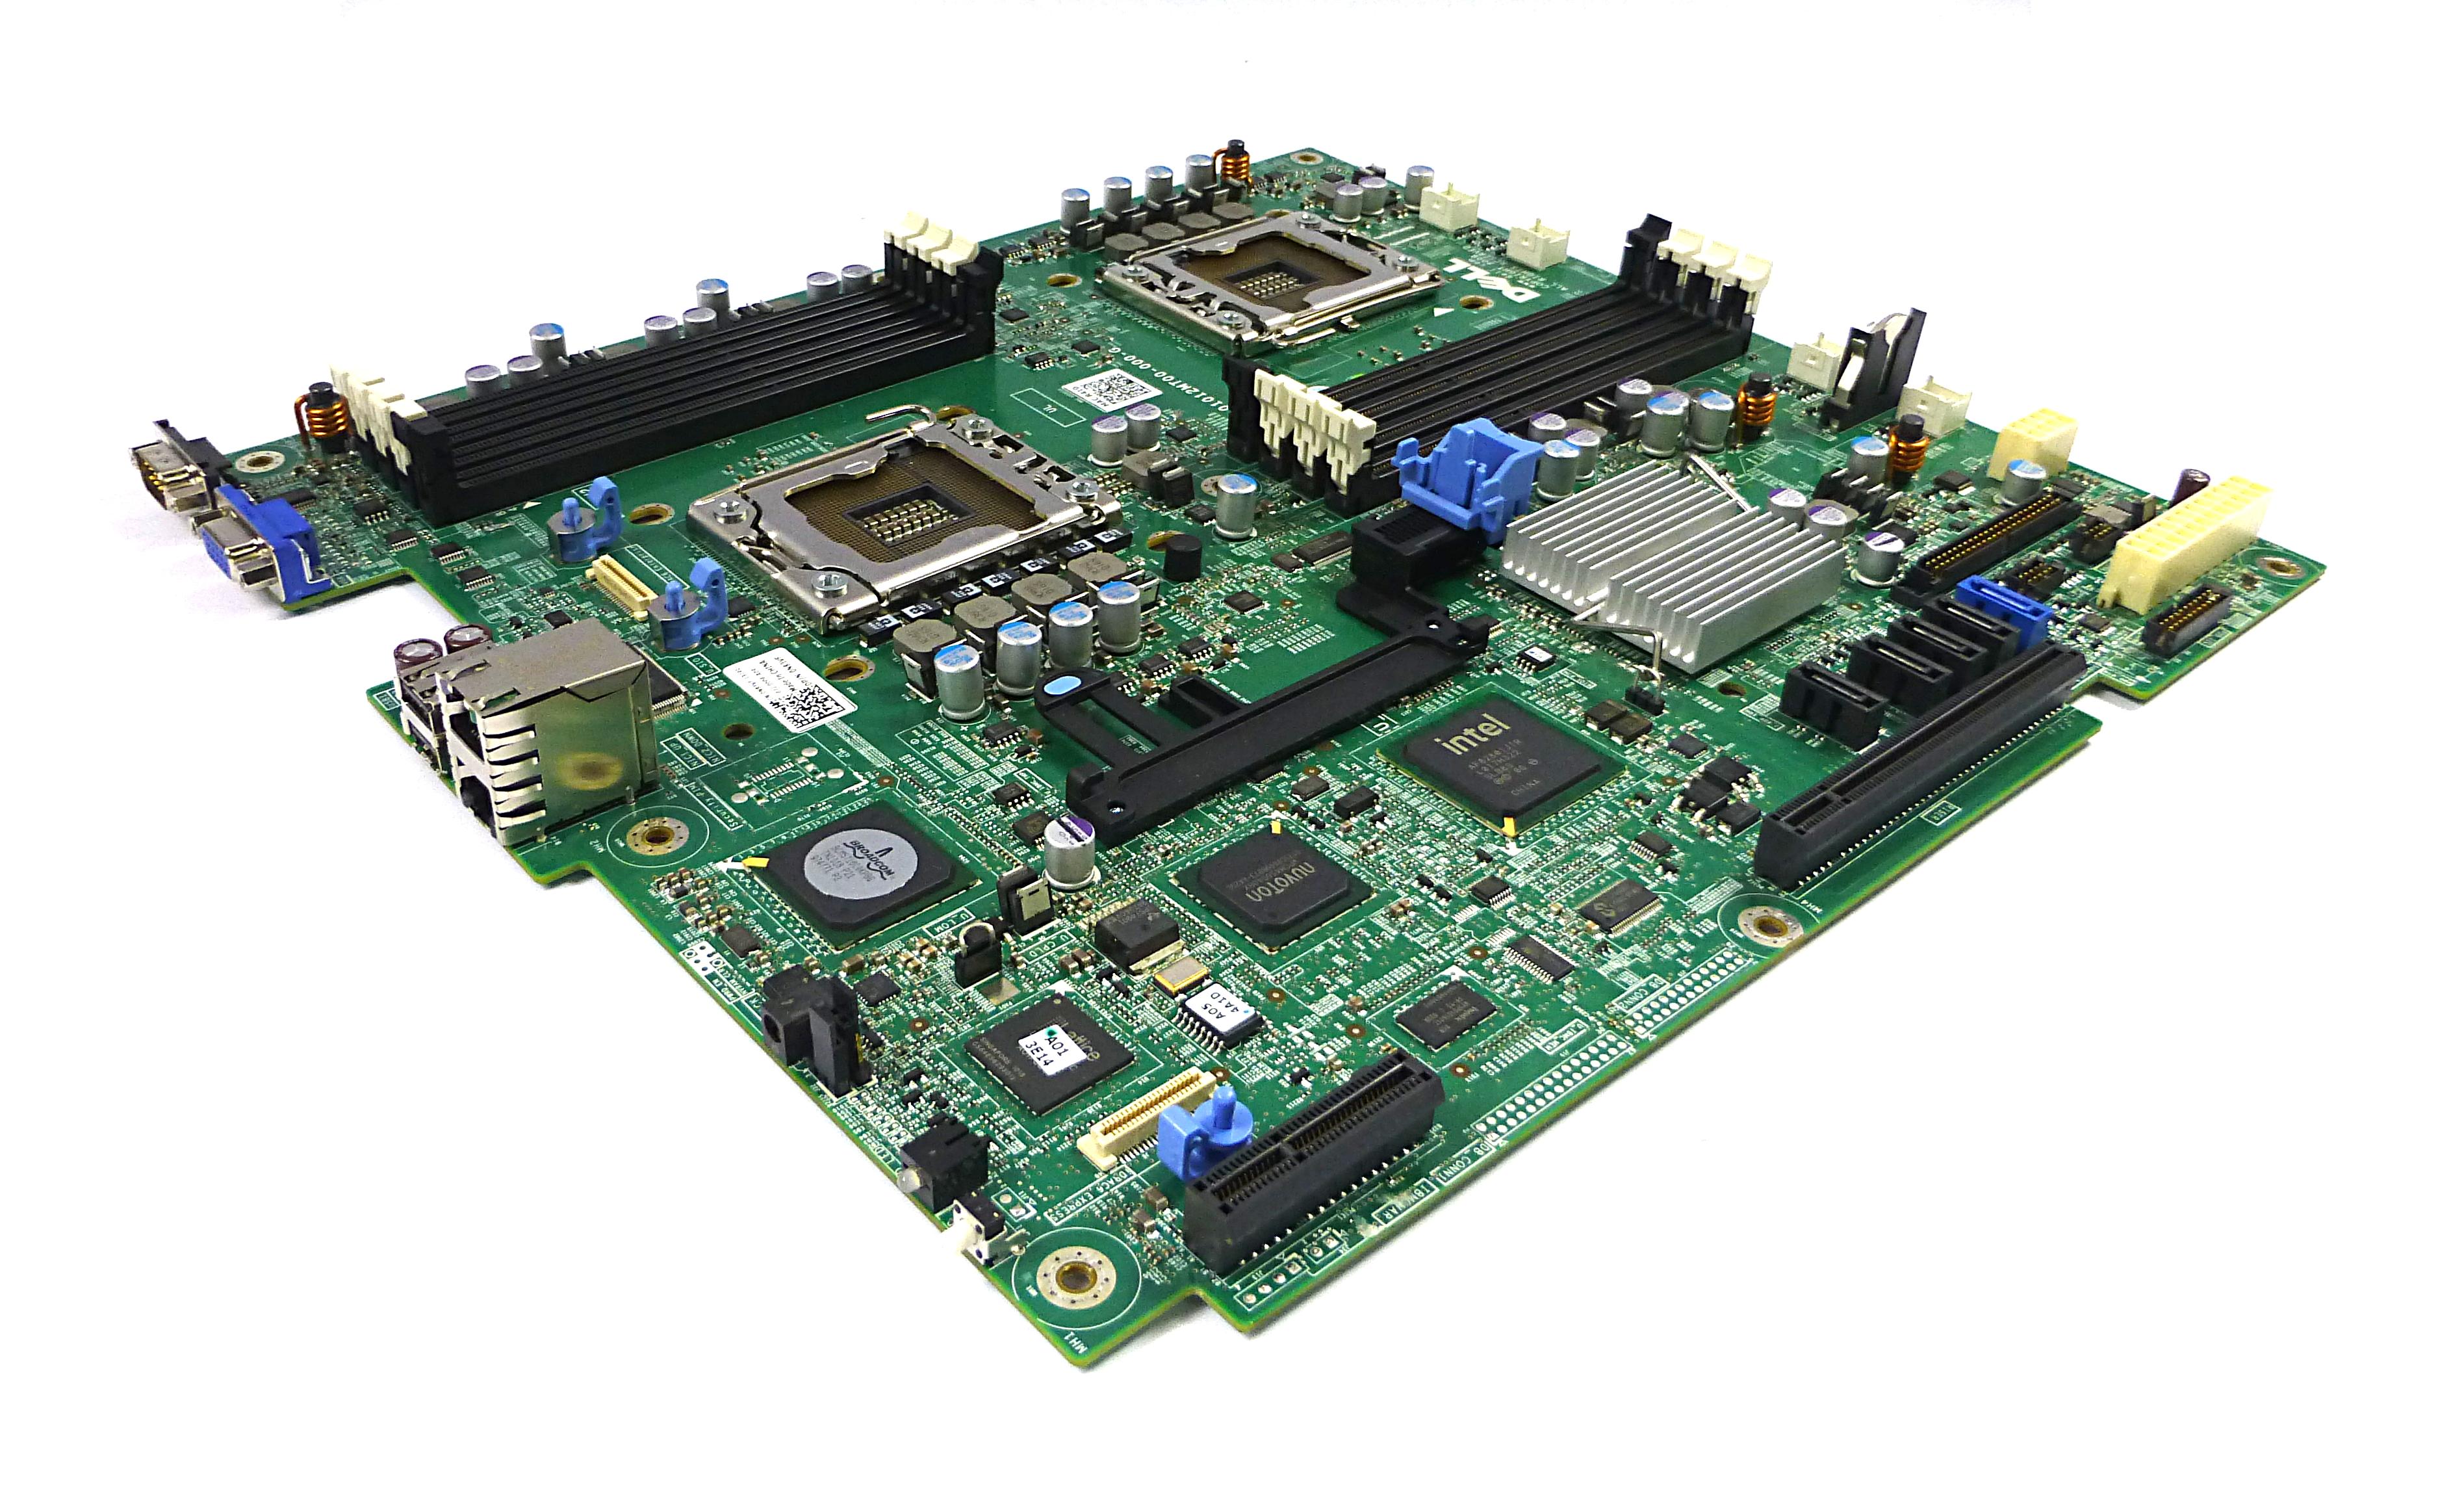 Dell N83VF Poweredge R410 Dual Socket LGA1366 System Board